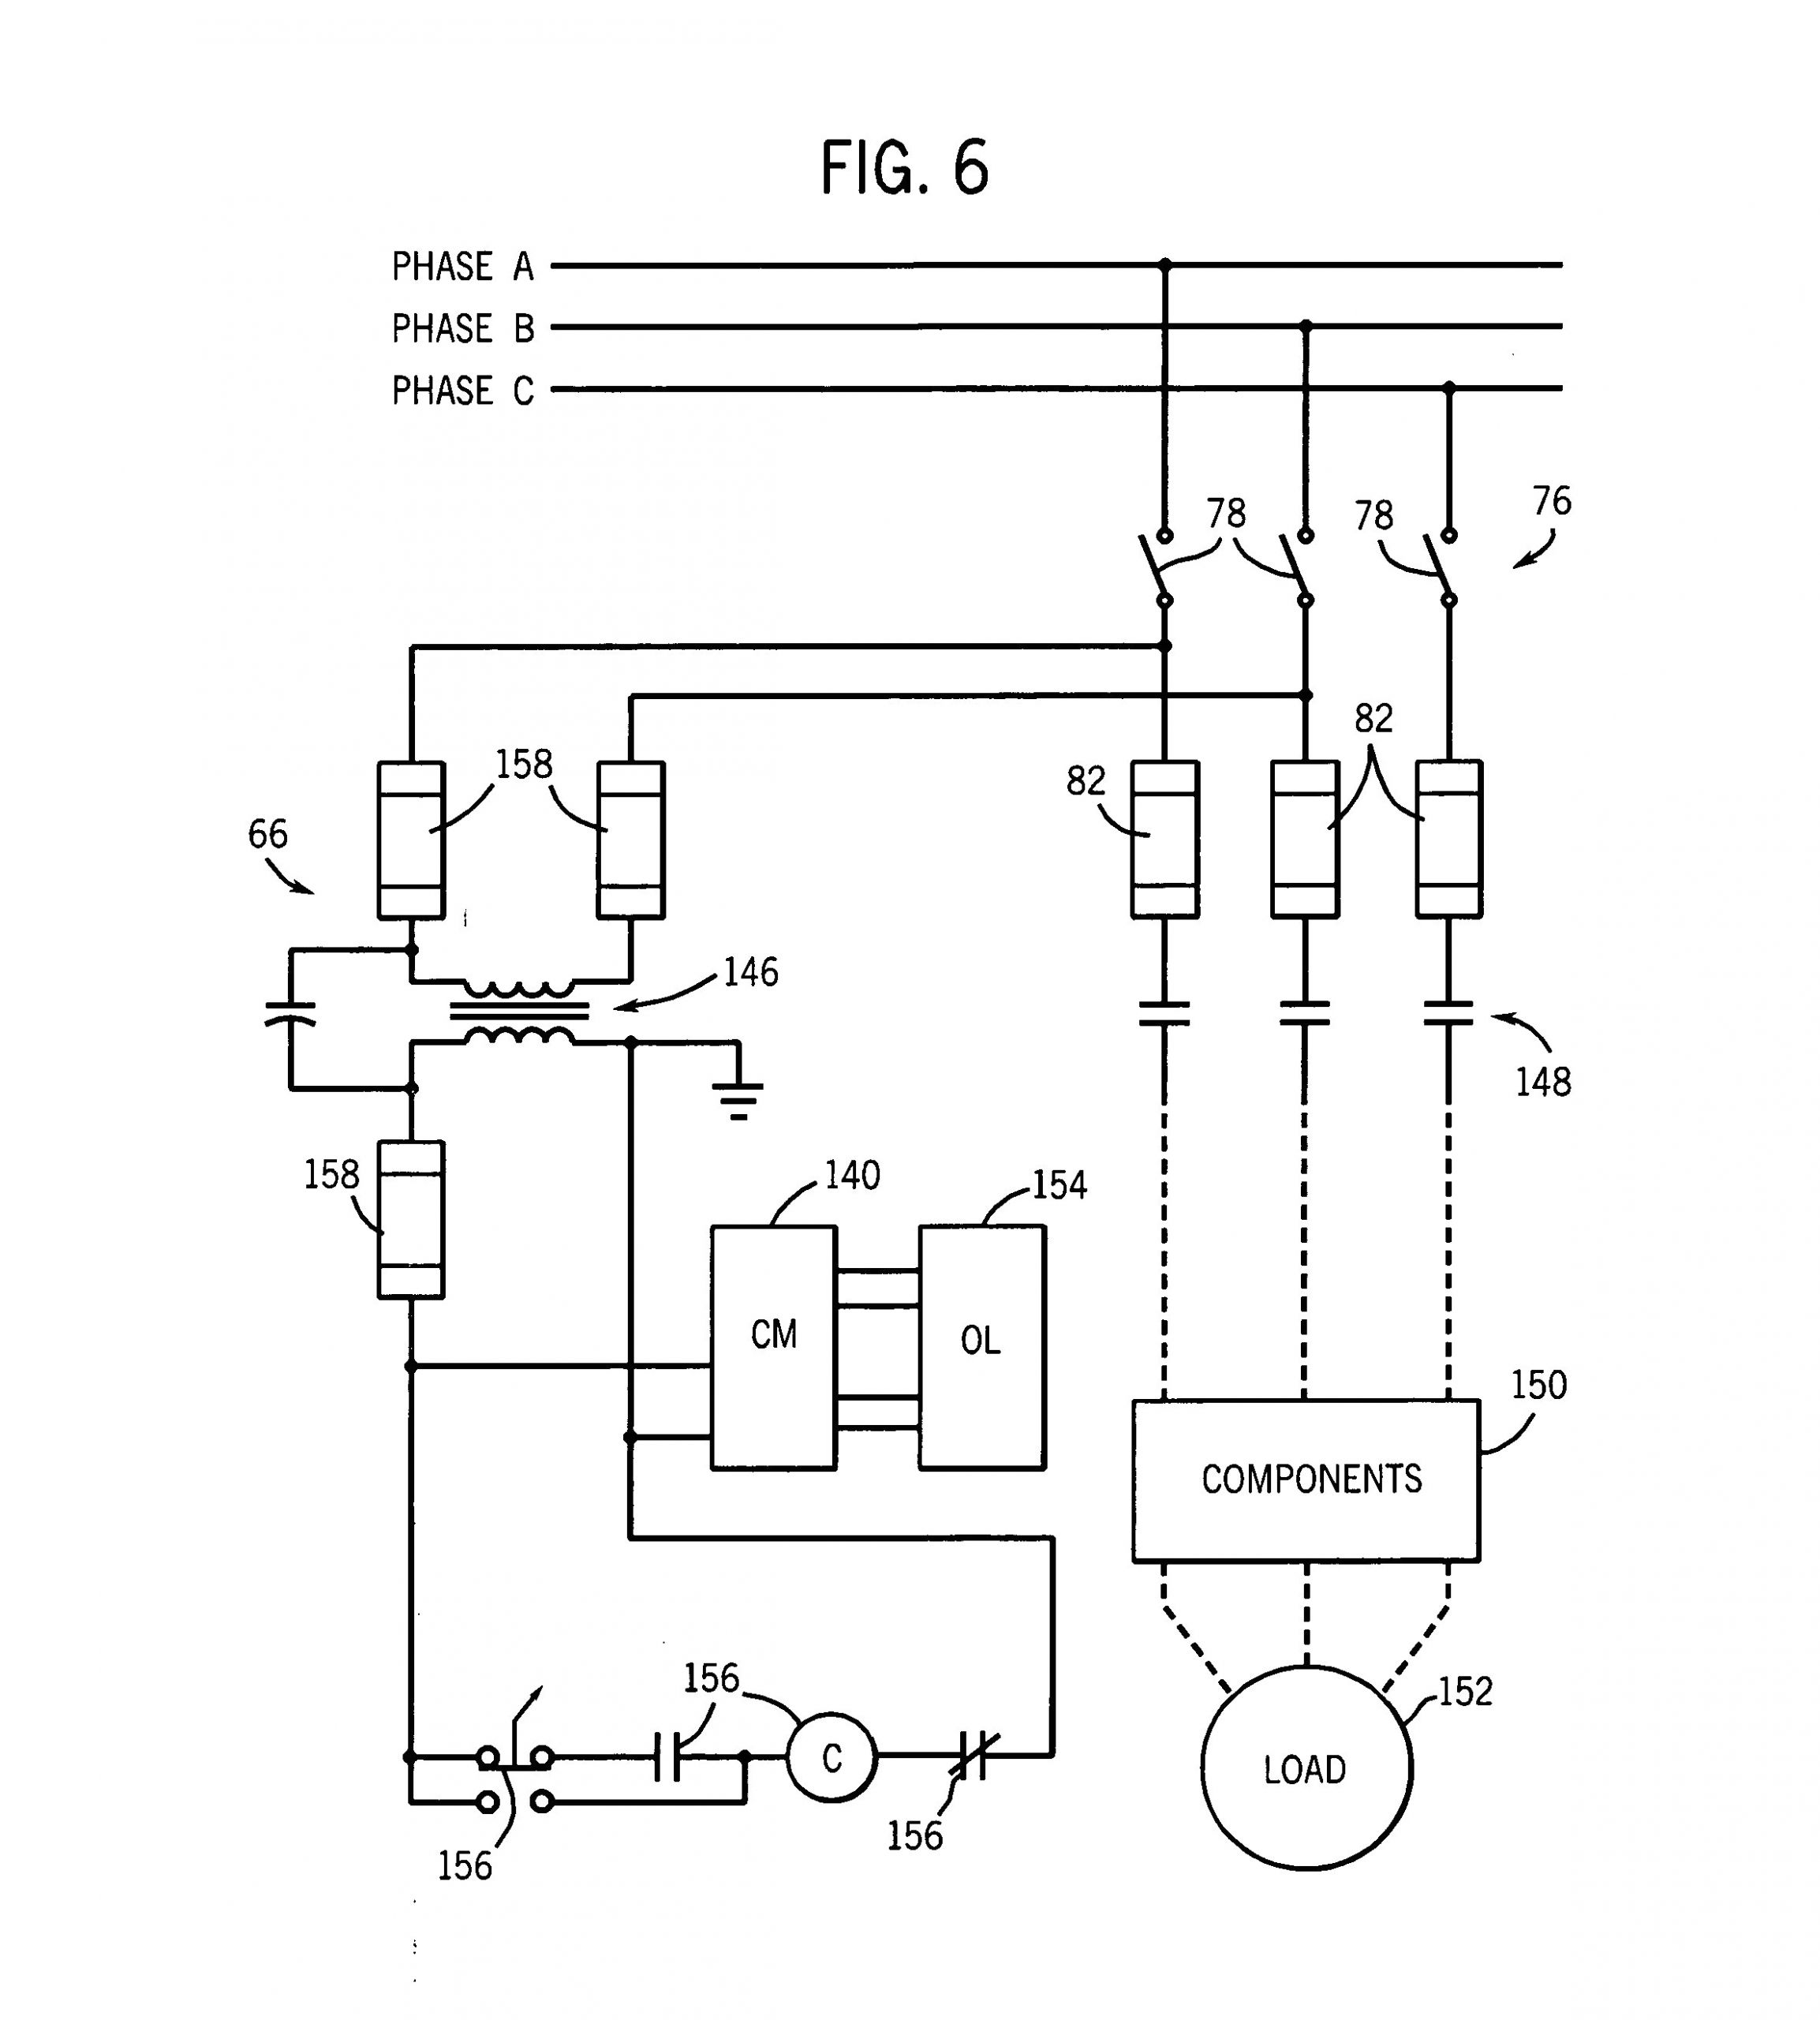 allen bradley 855t bcb wiring diagram allen bradley motor starter wiring diagram and control diagrams fine rh chromatex me 7f jpg